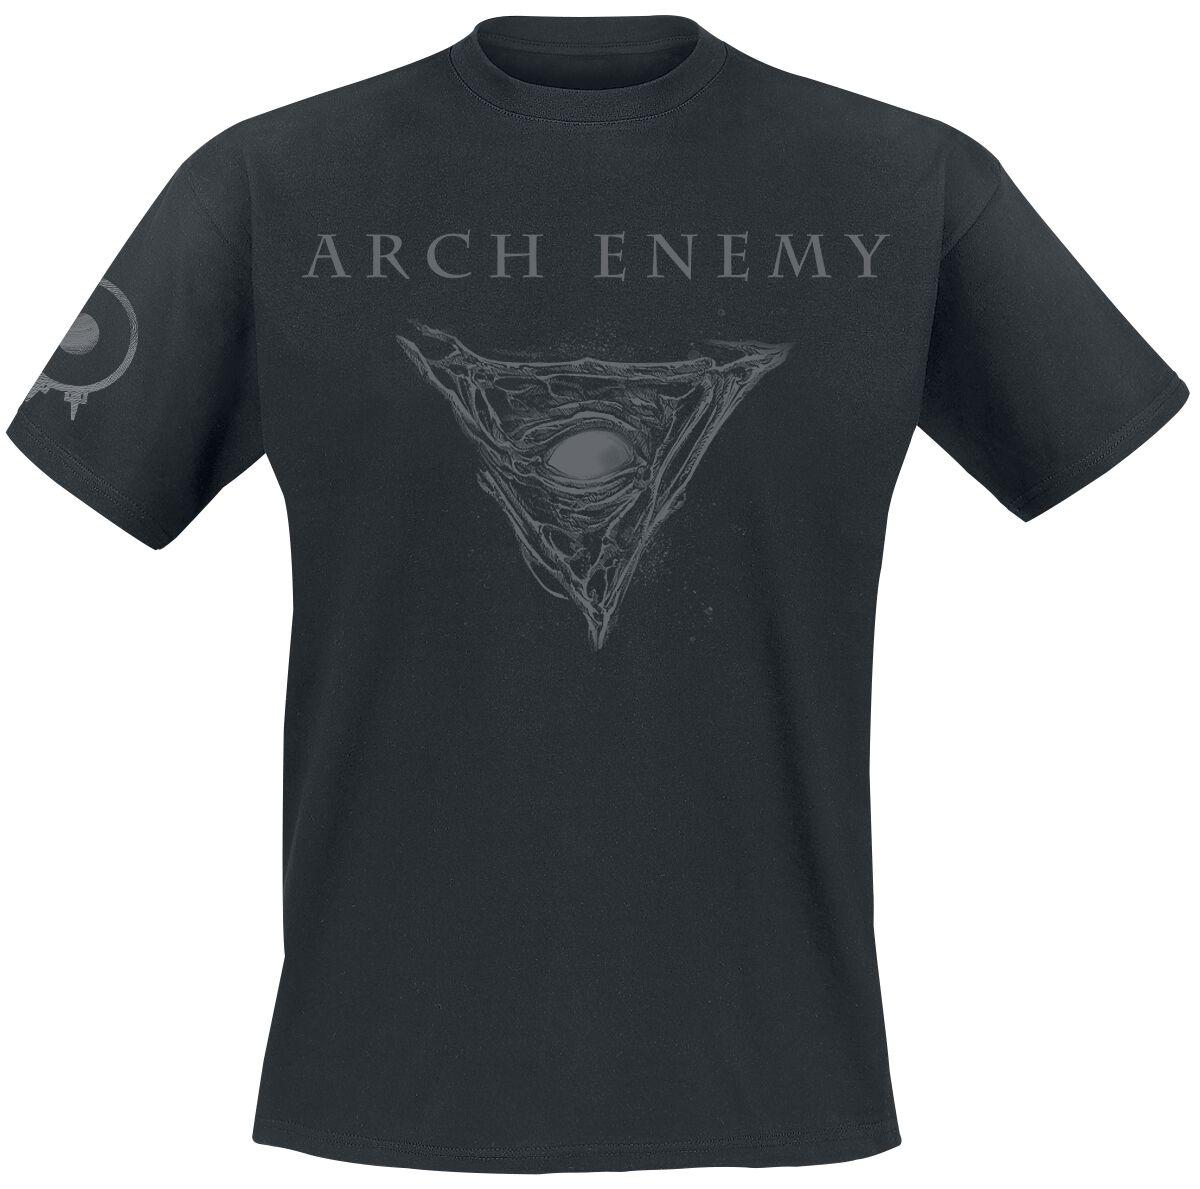 Image of Arch Enemy Demon Skull T-Shirt schwarz